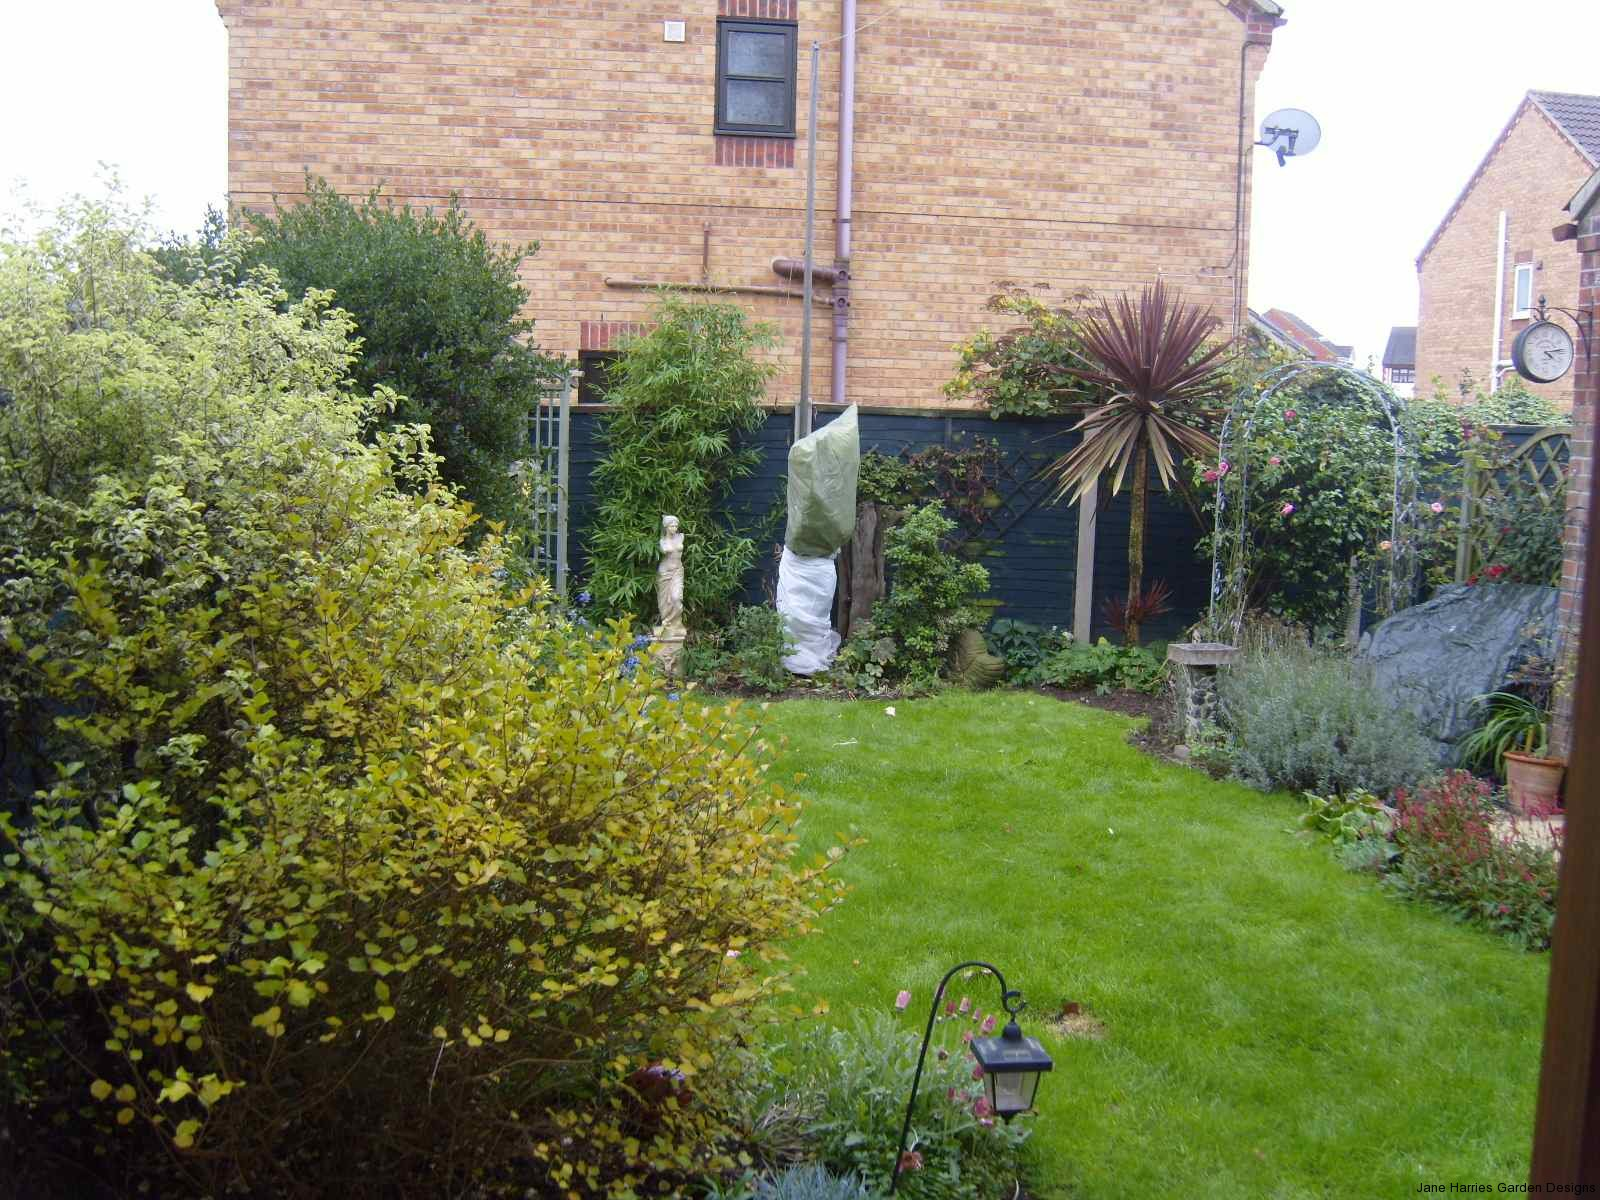 Existing garden showing overgrown shrubs